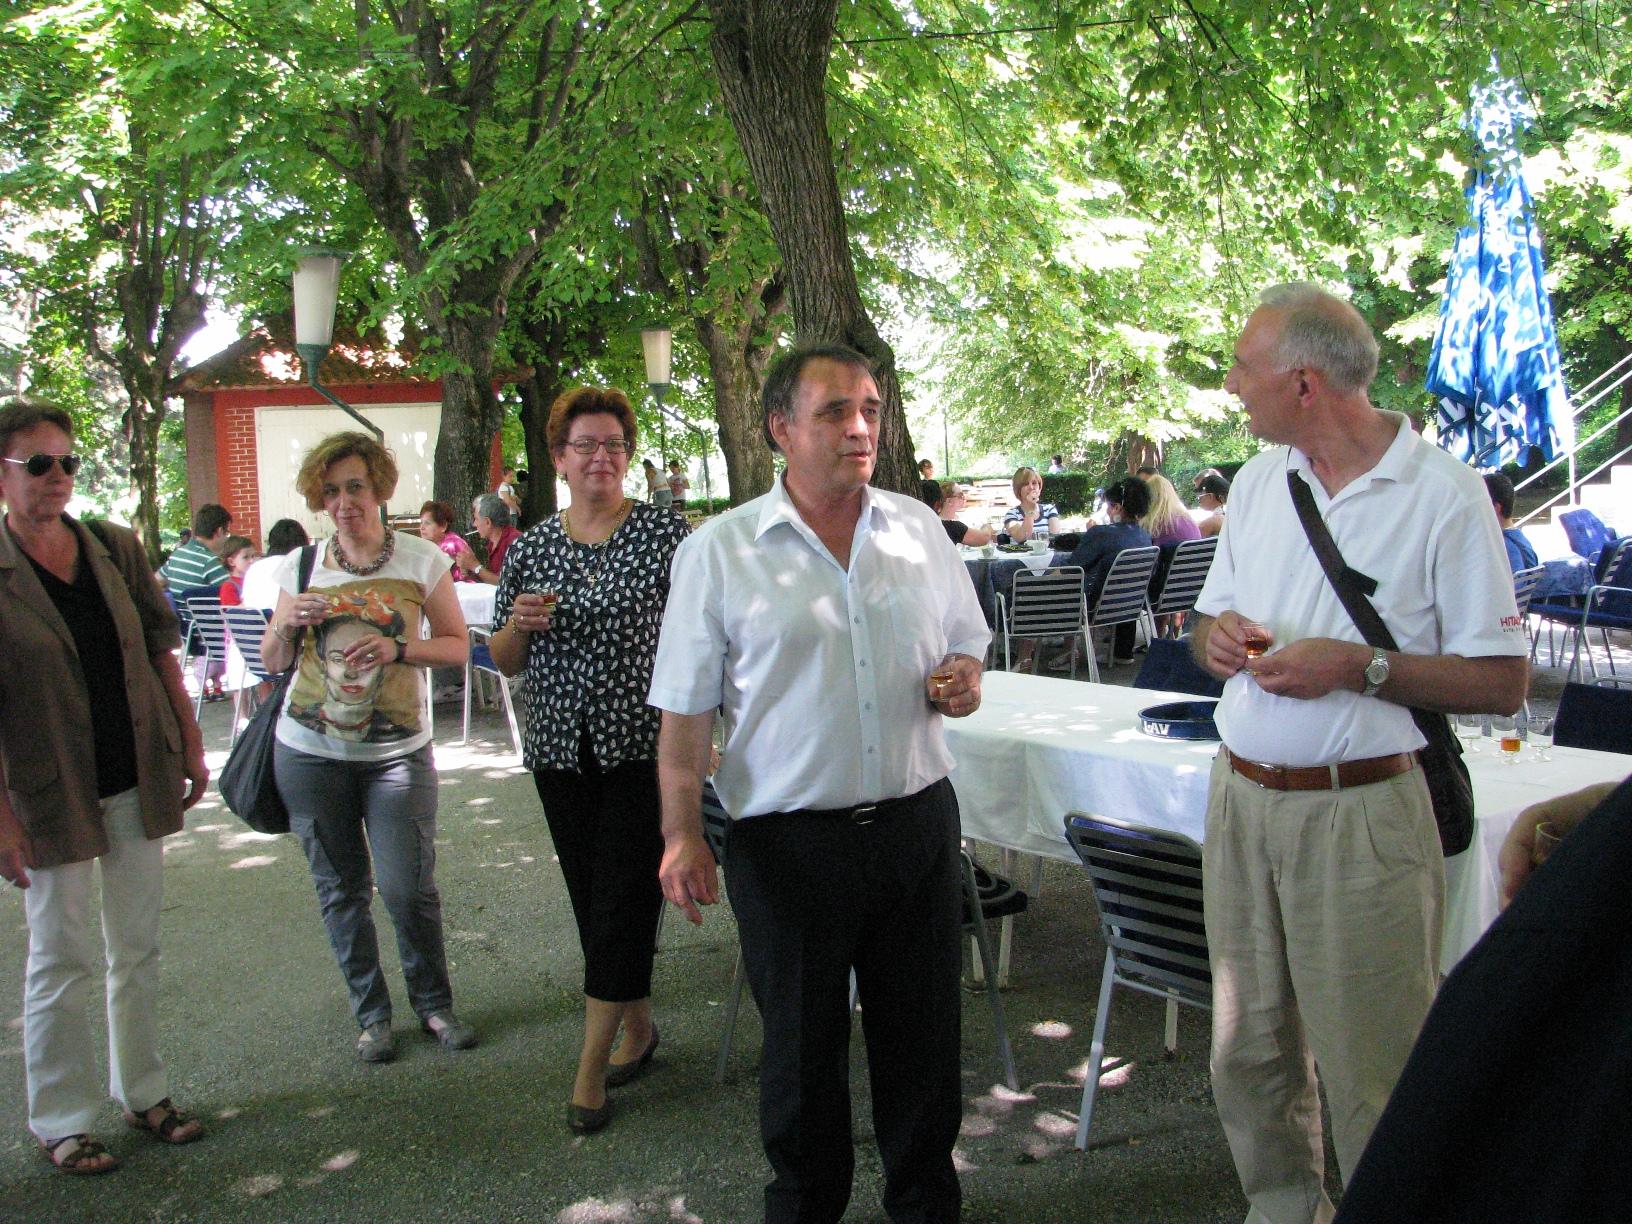 17_-_prof._dr_dobrivoje_mihailovic_drzi_zdravicu